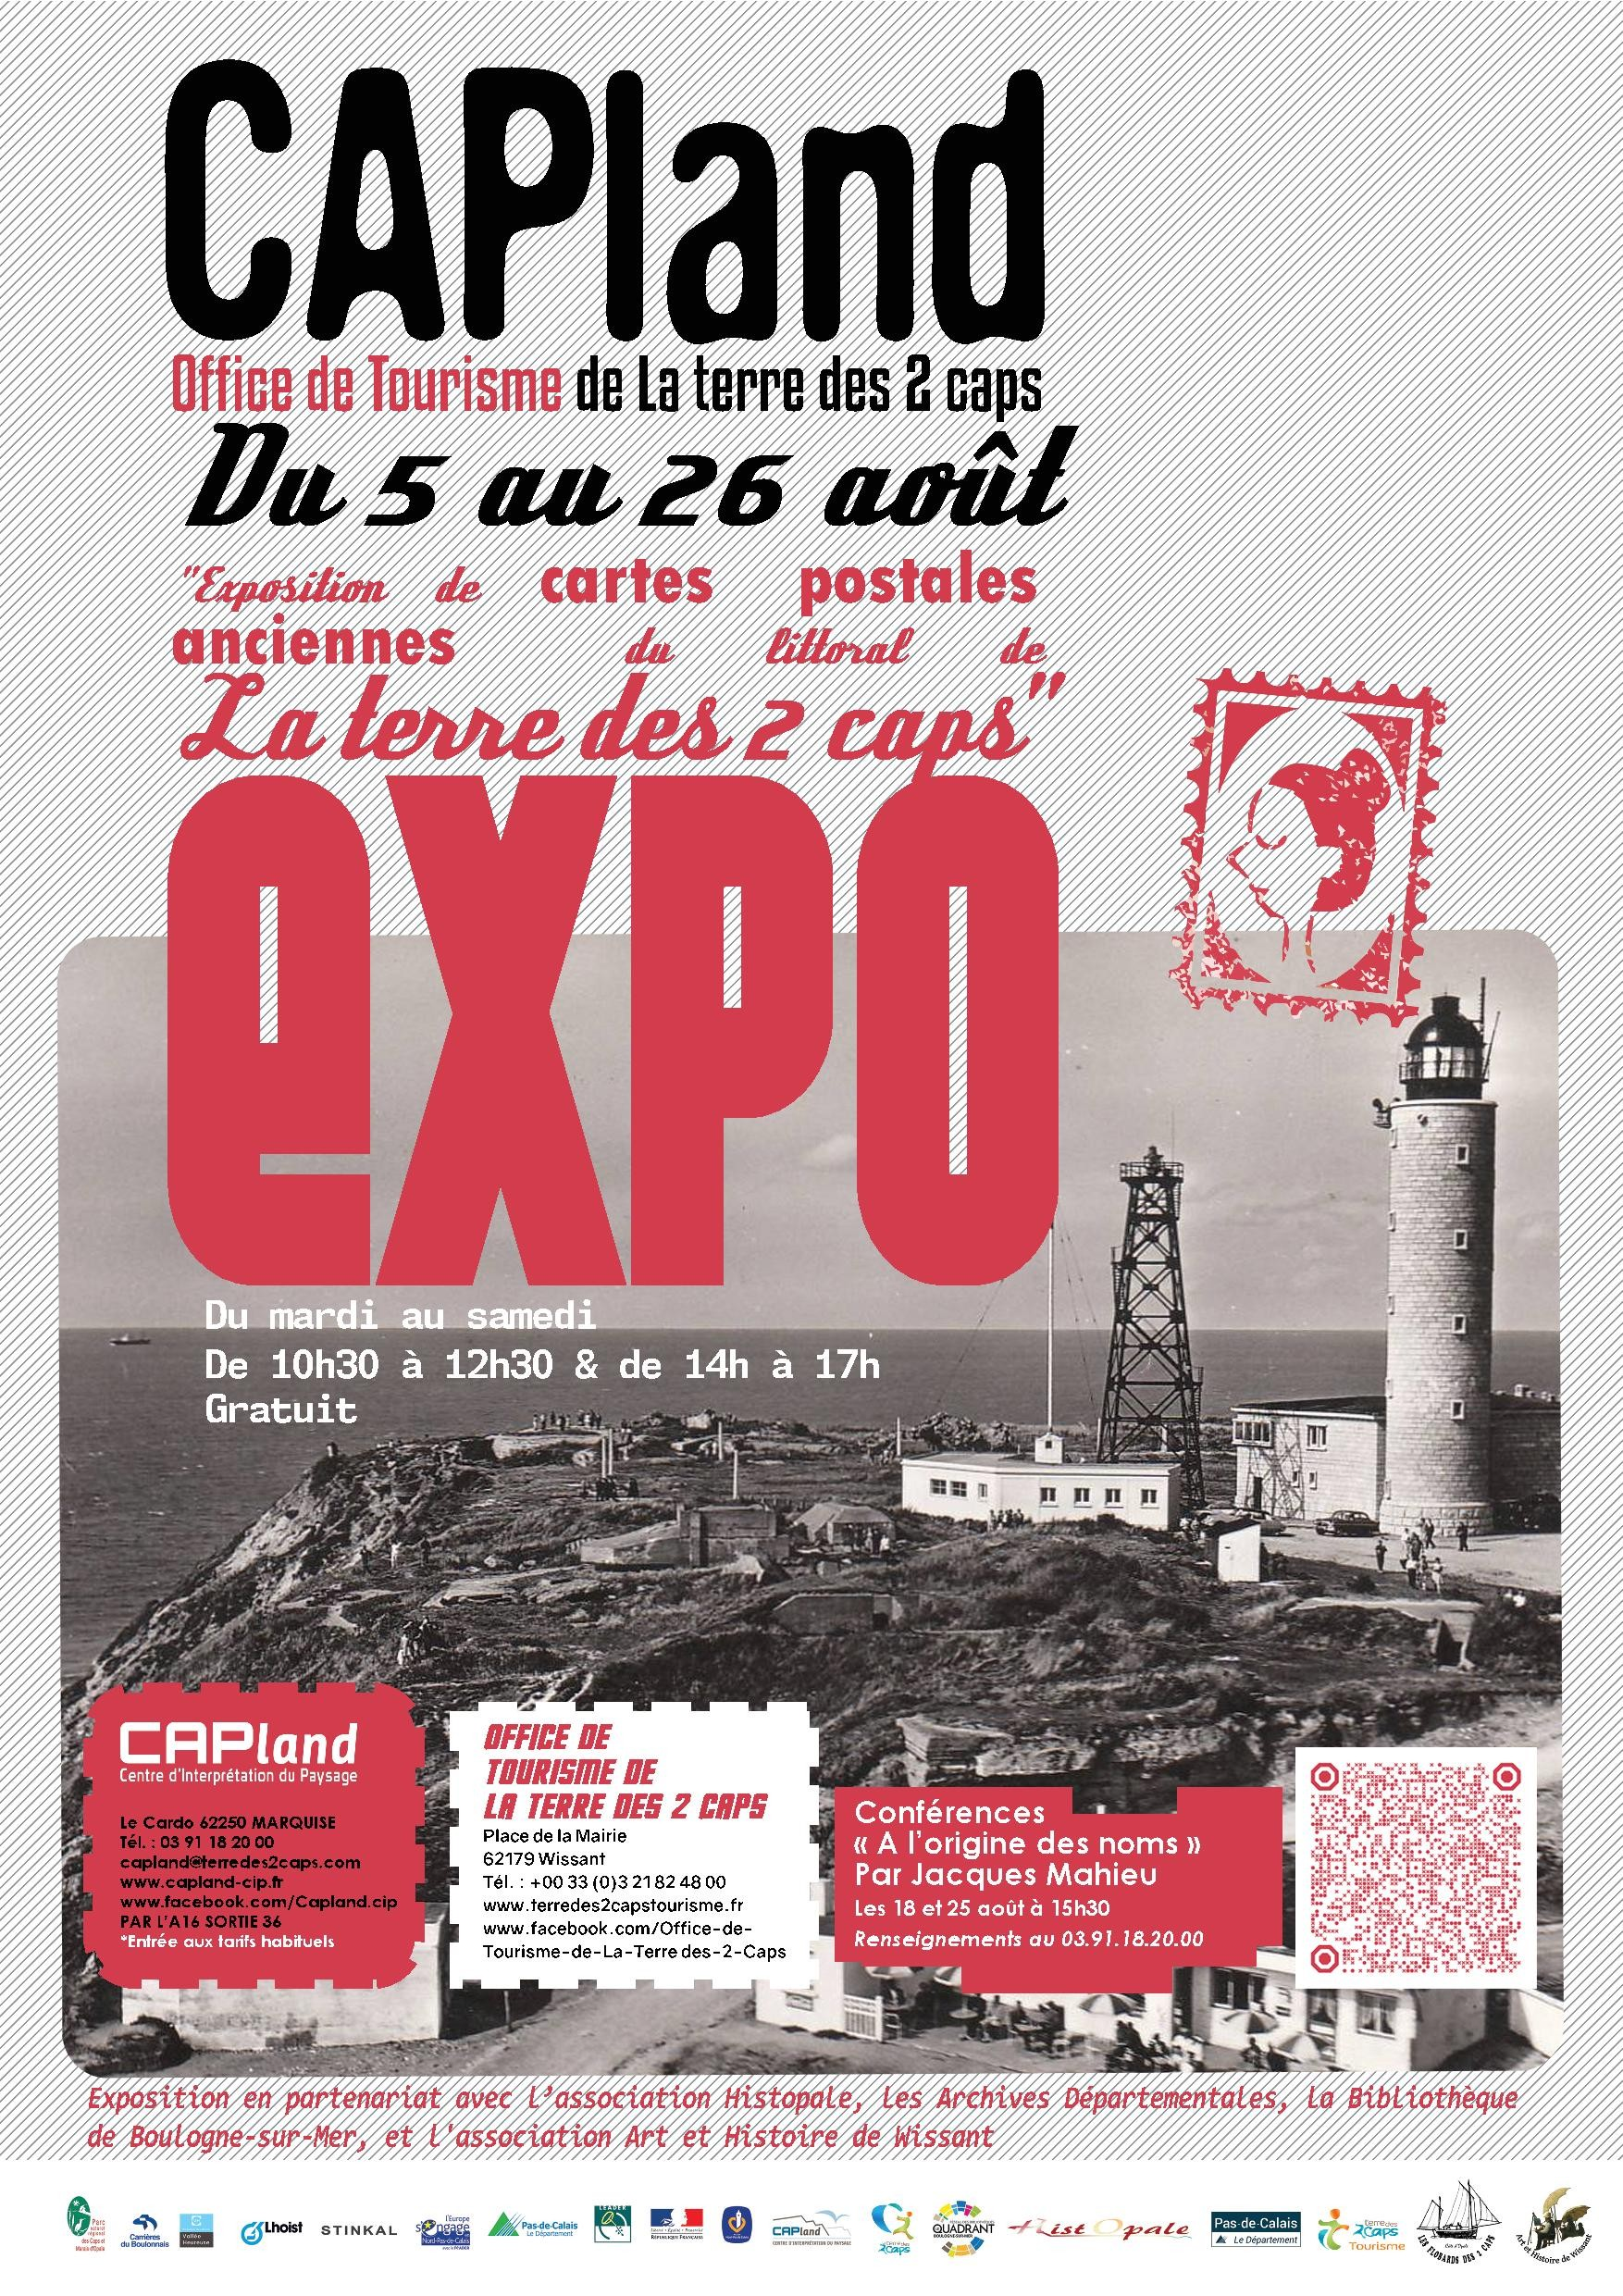 201708-capland-expo-cartes-post